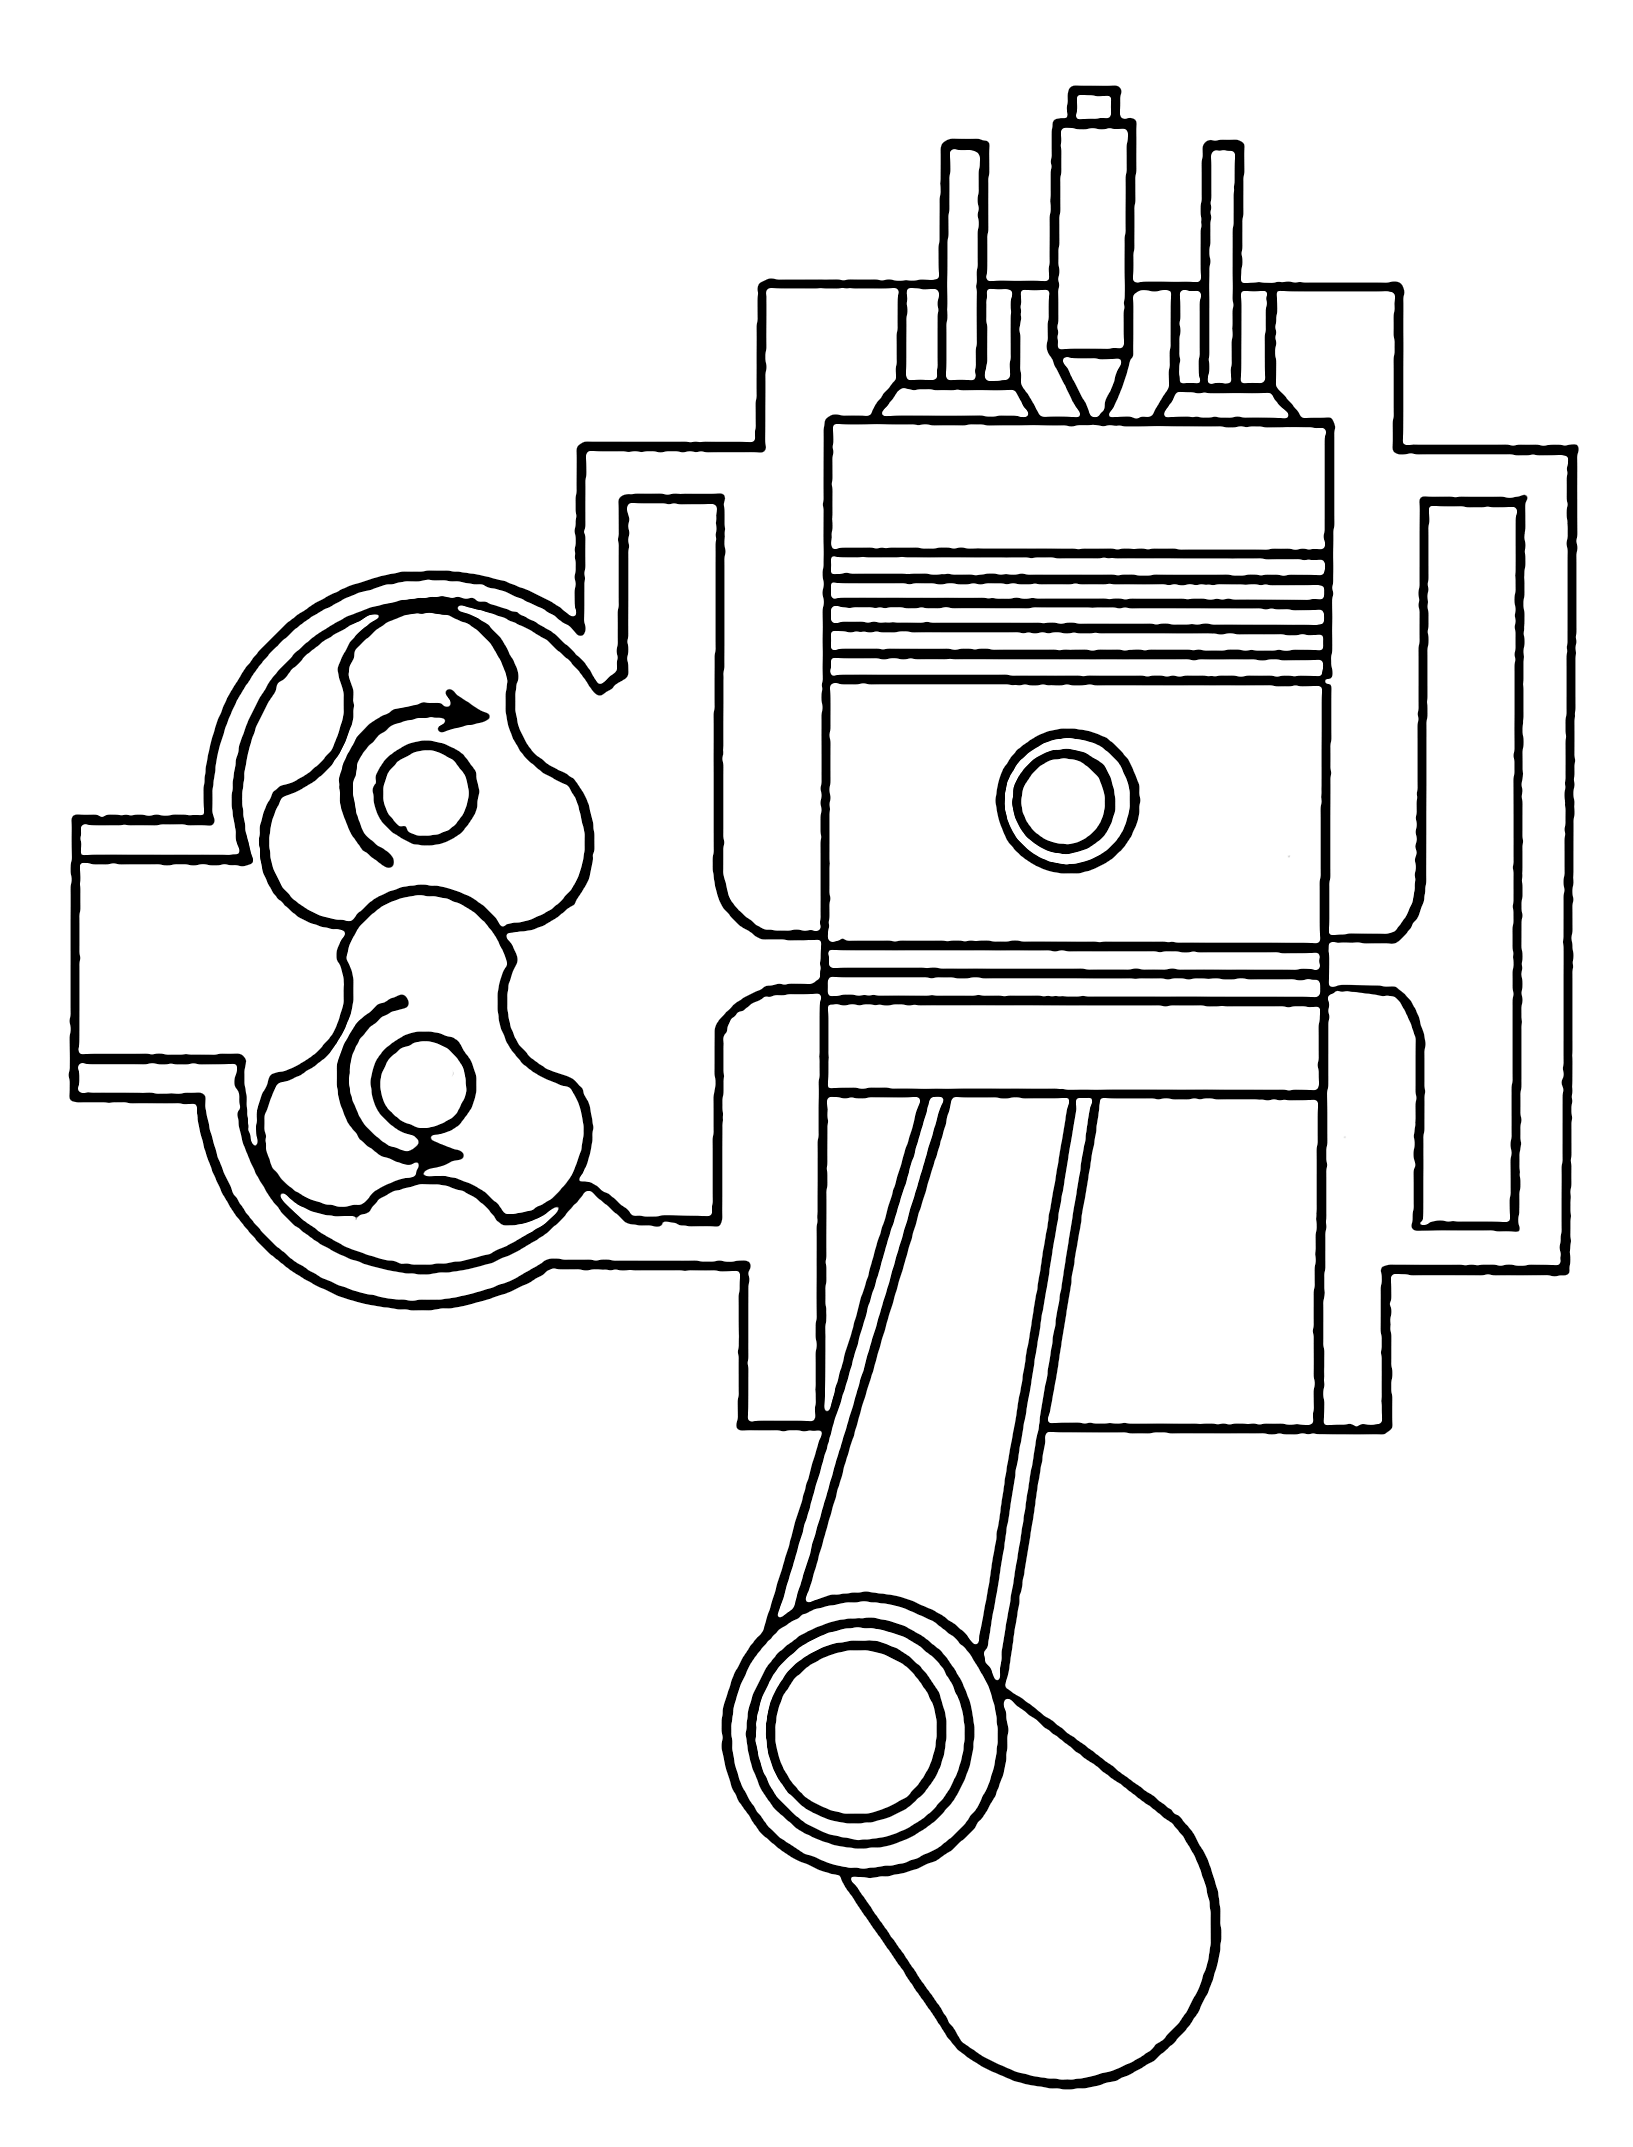 8 2 detroit fuel pump  8  free engine image for user